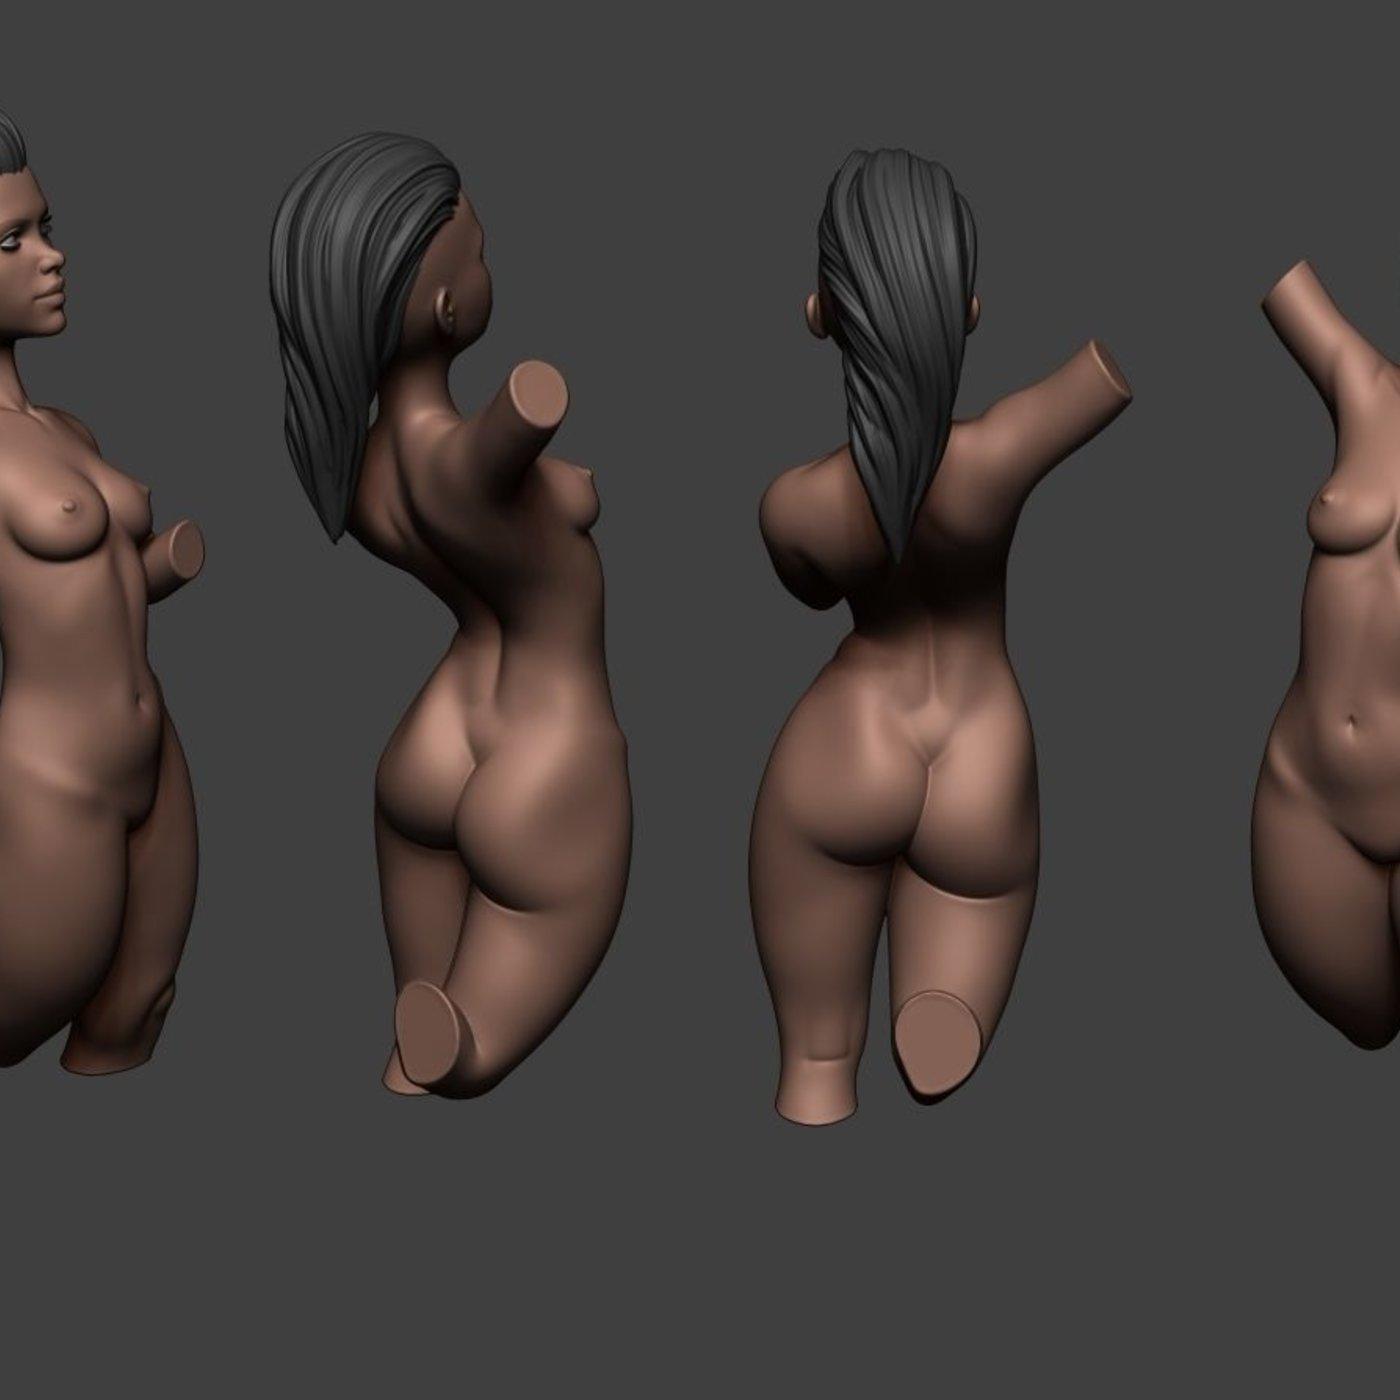 Zbrush Girl Pose